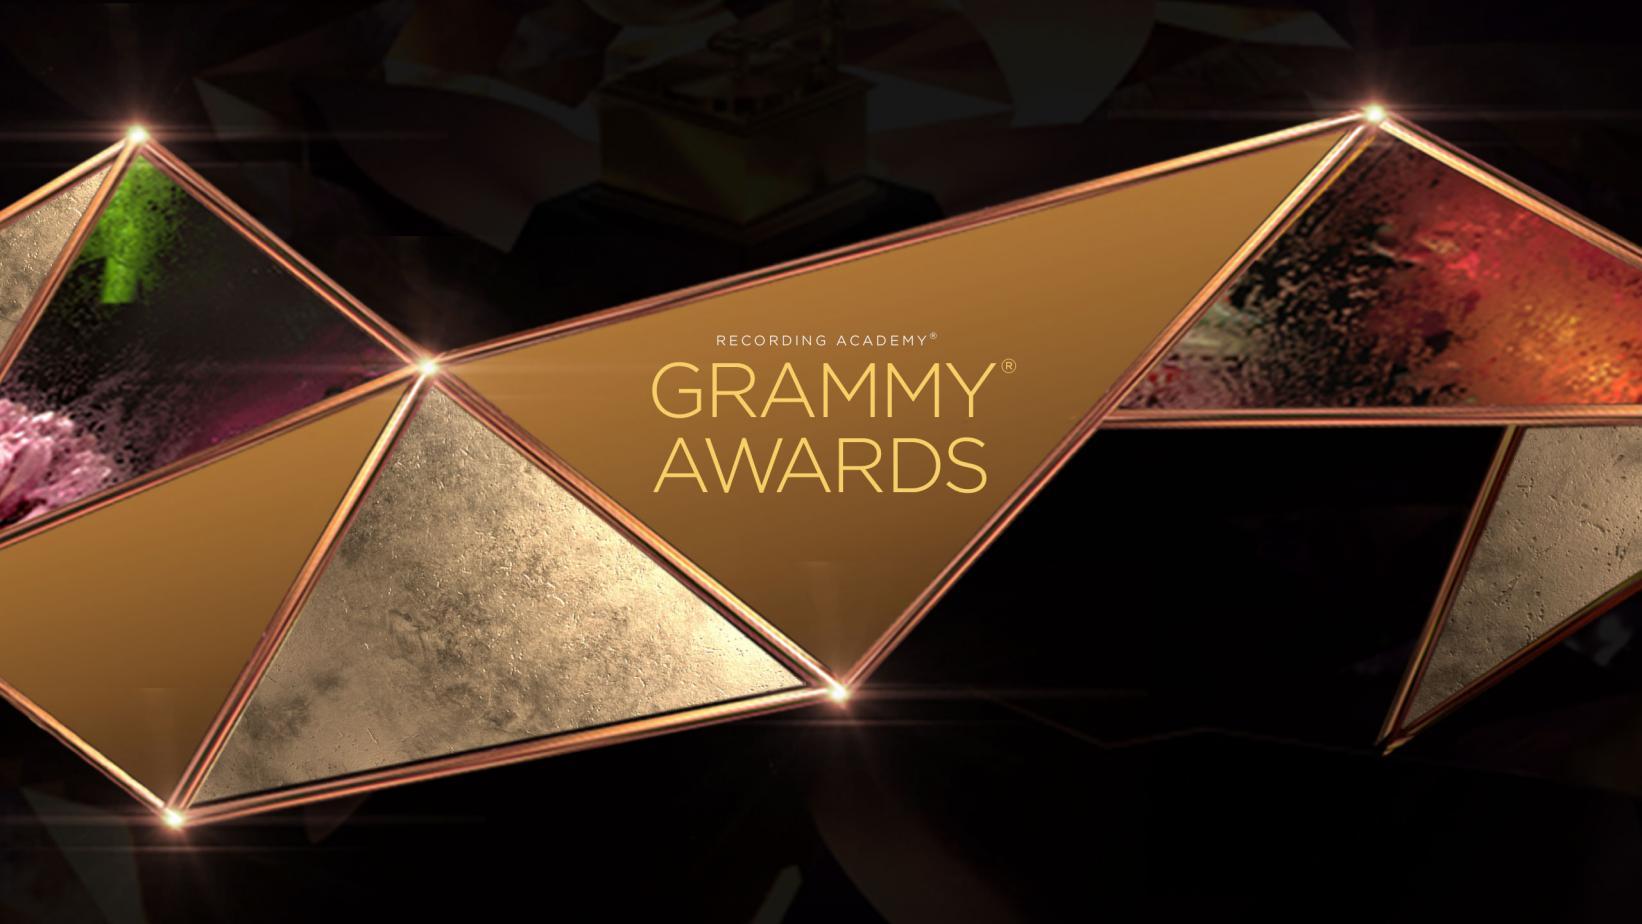 Grammys 2021 announced